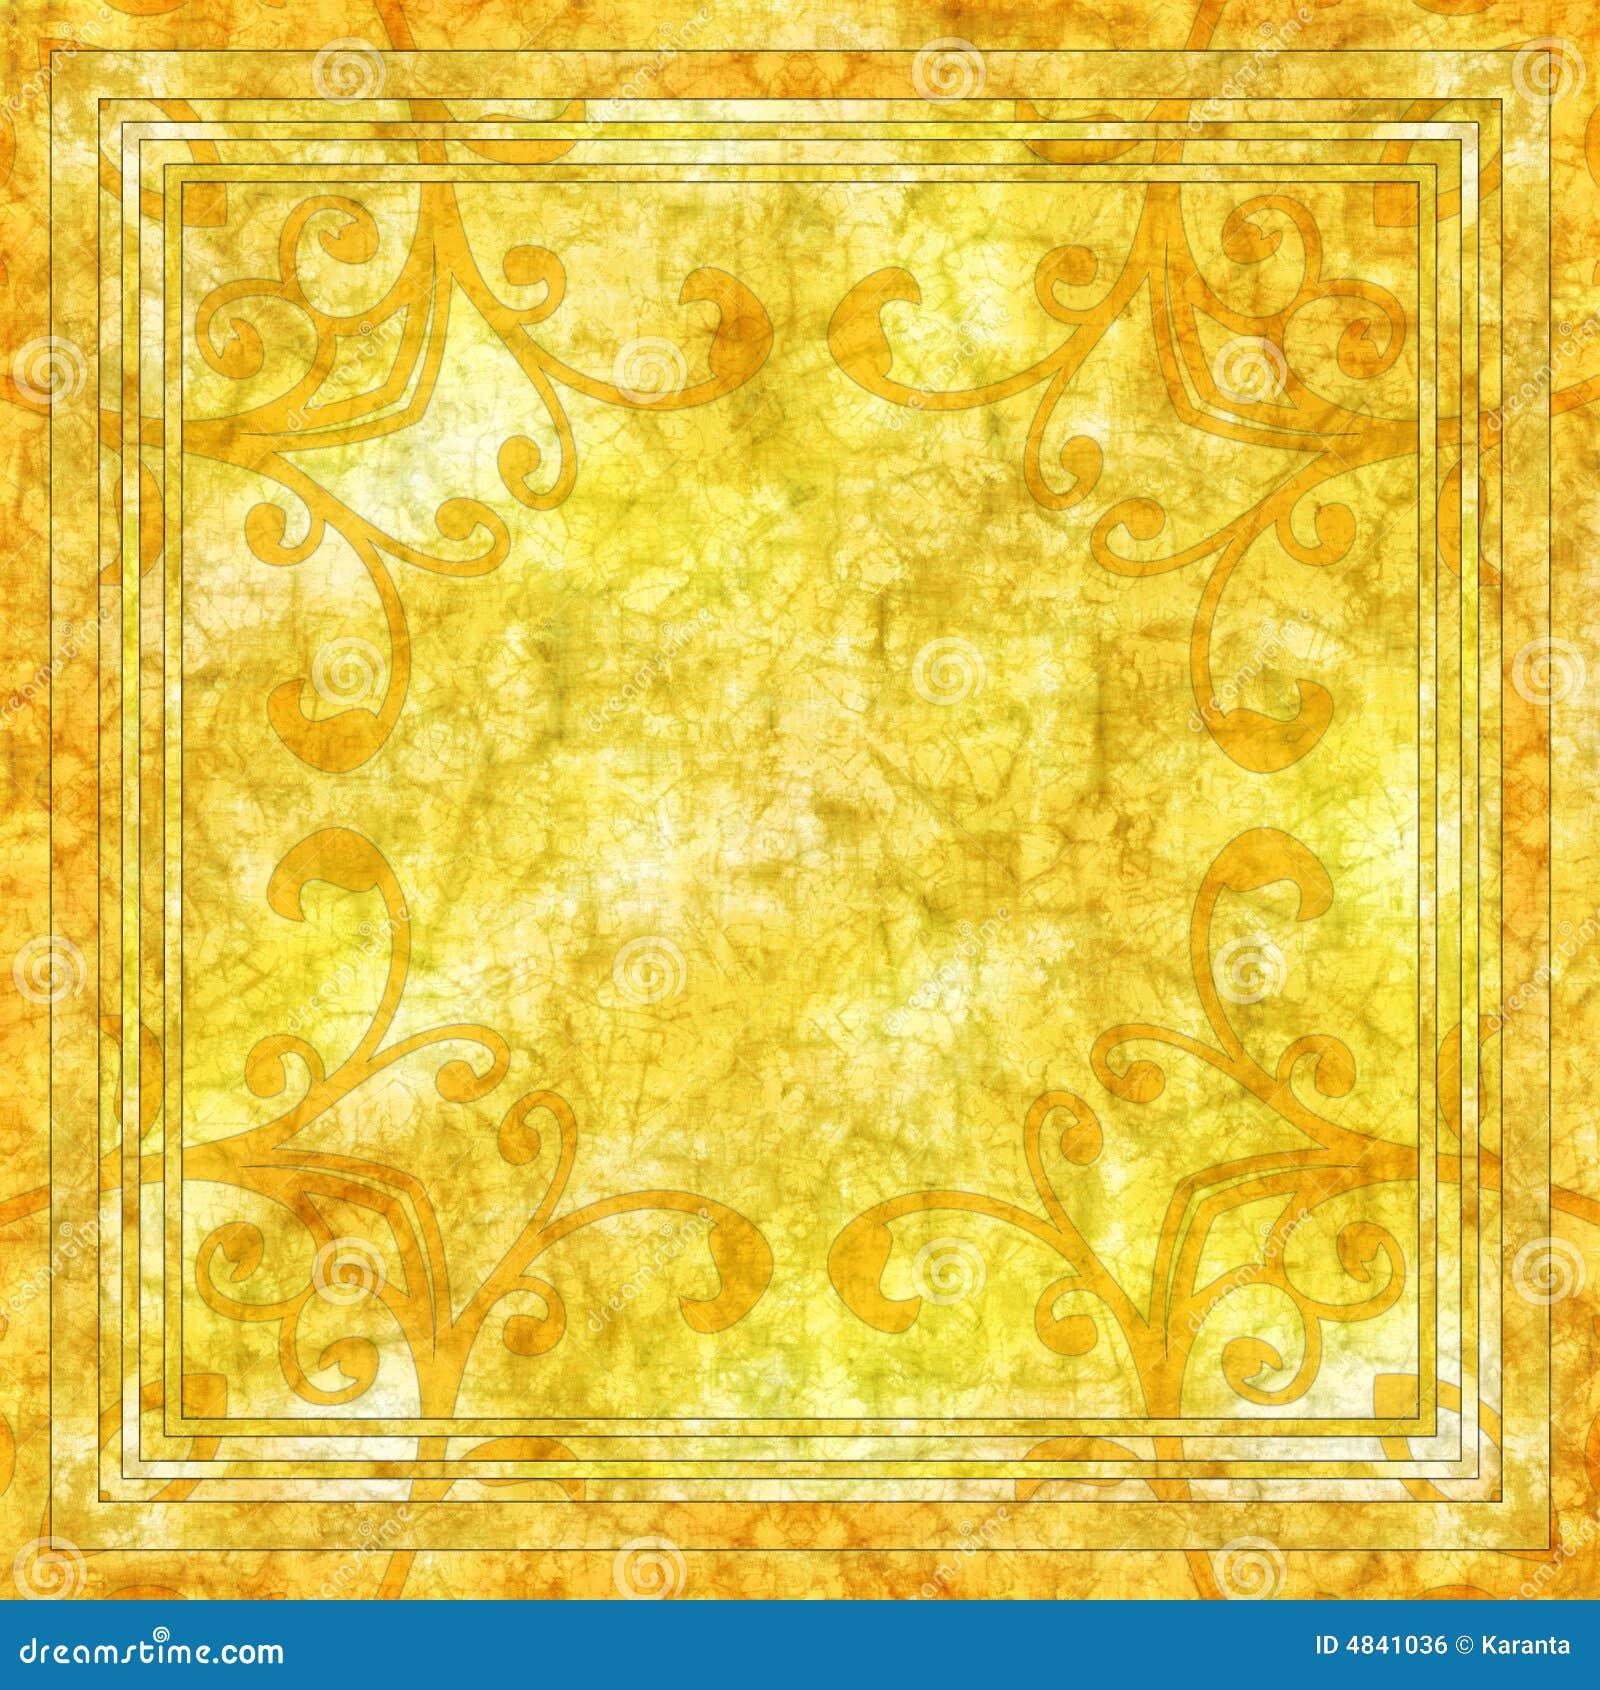 yellow batik background stock illustration illustration of backdrop